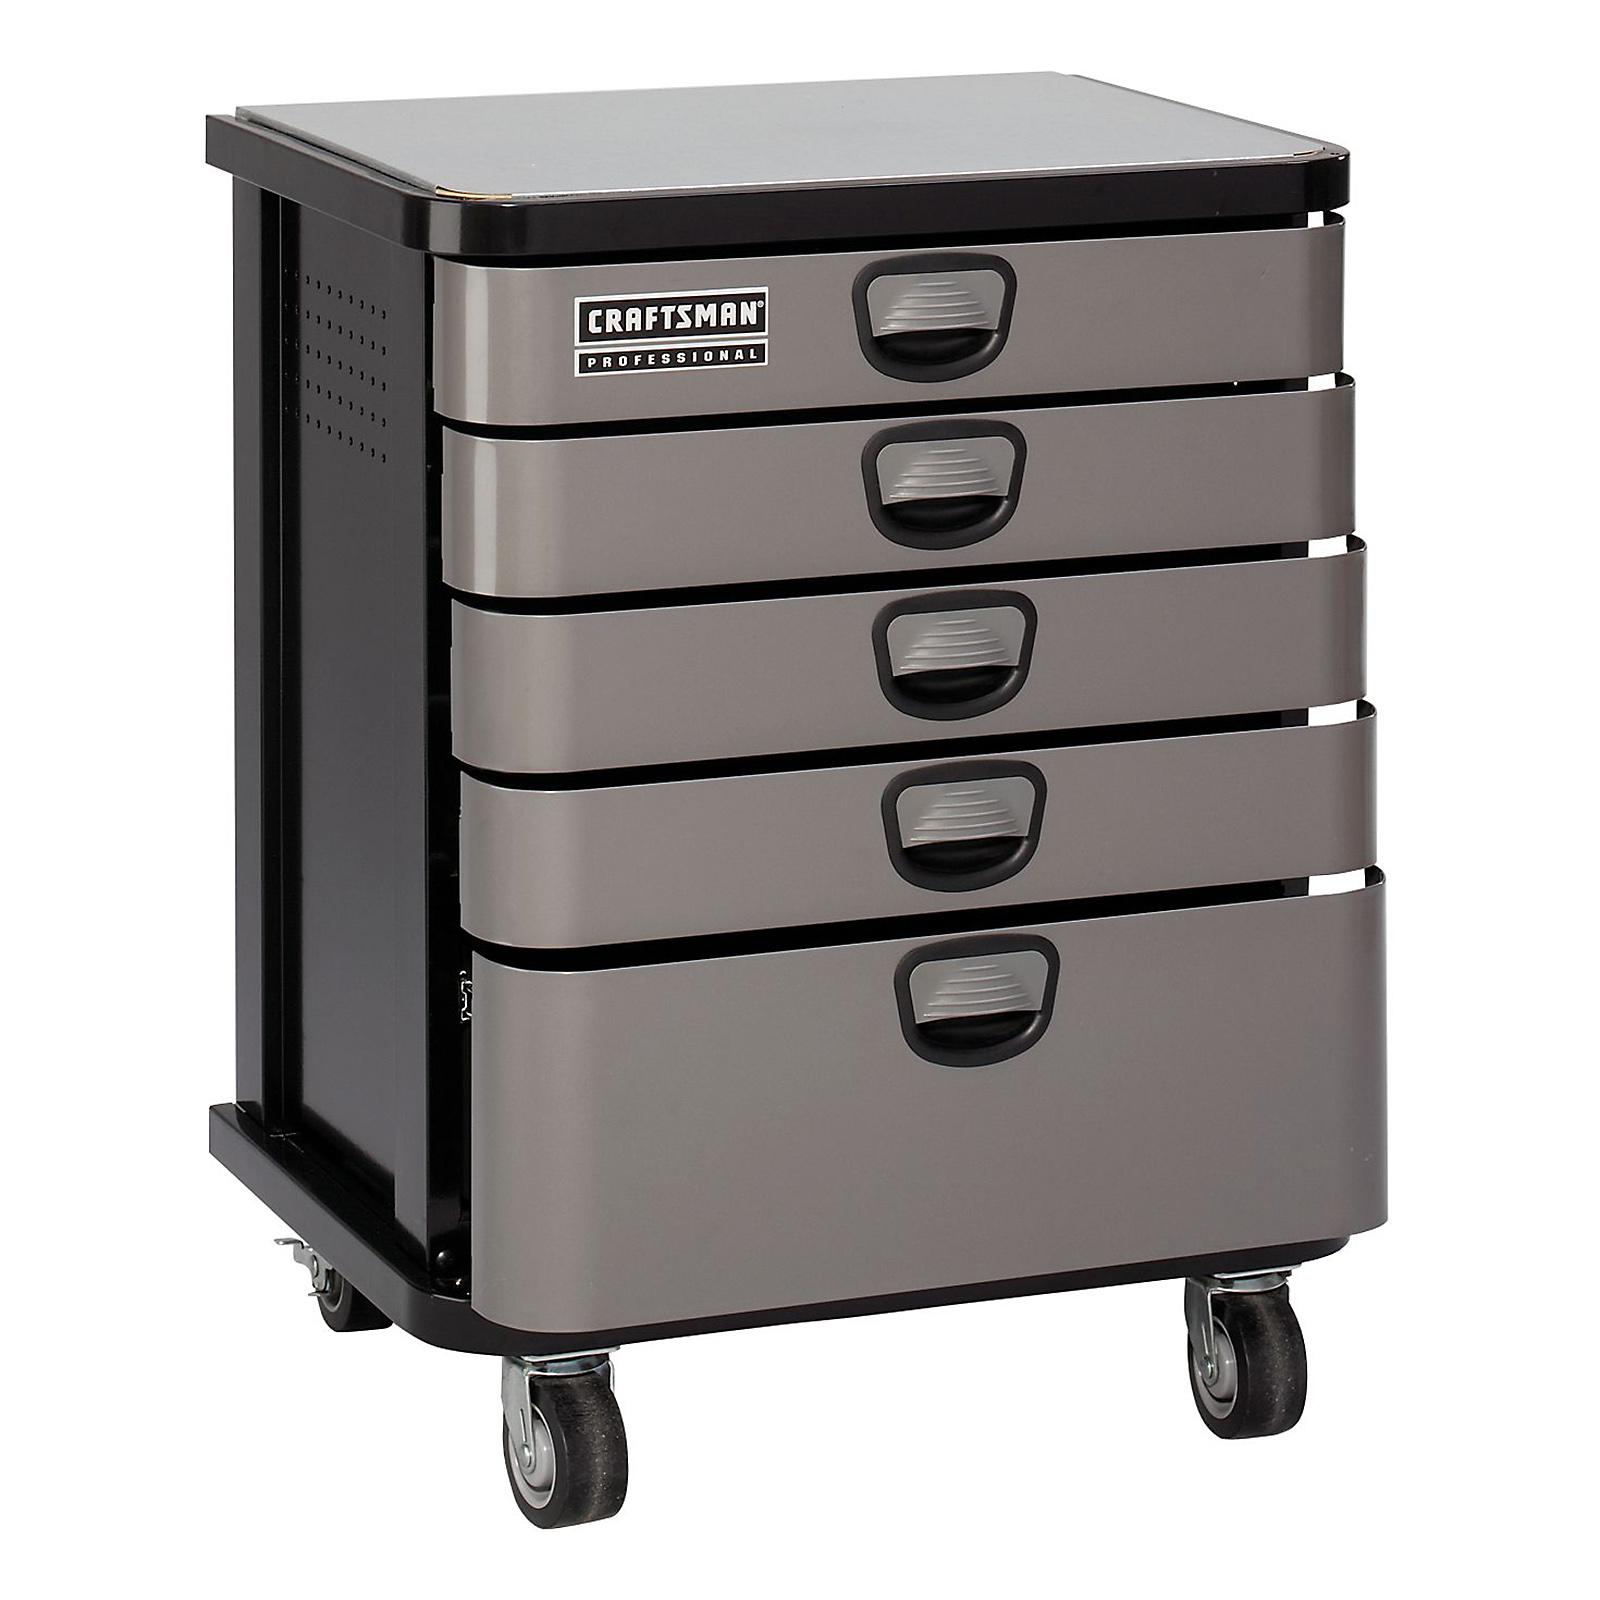 Craftsman Professional 5-Drawer Mobile Cabinet - Platinum